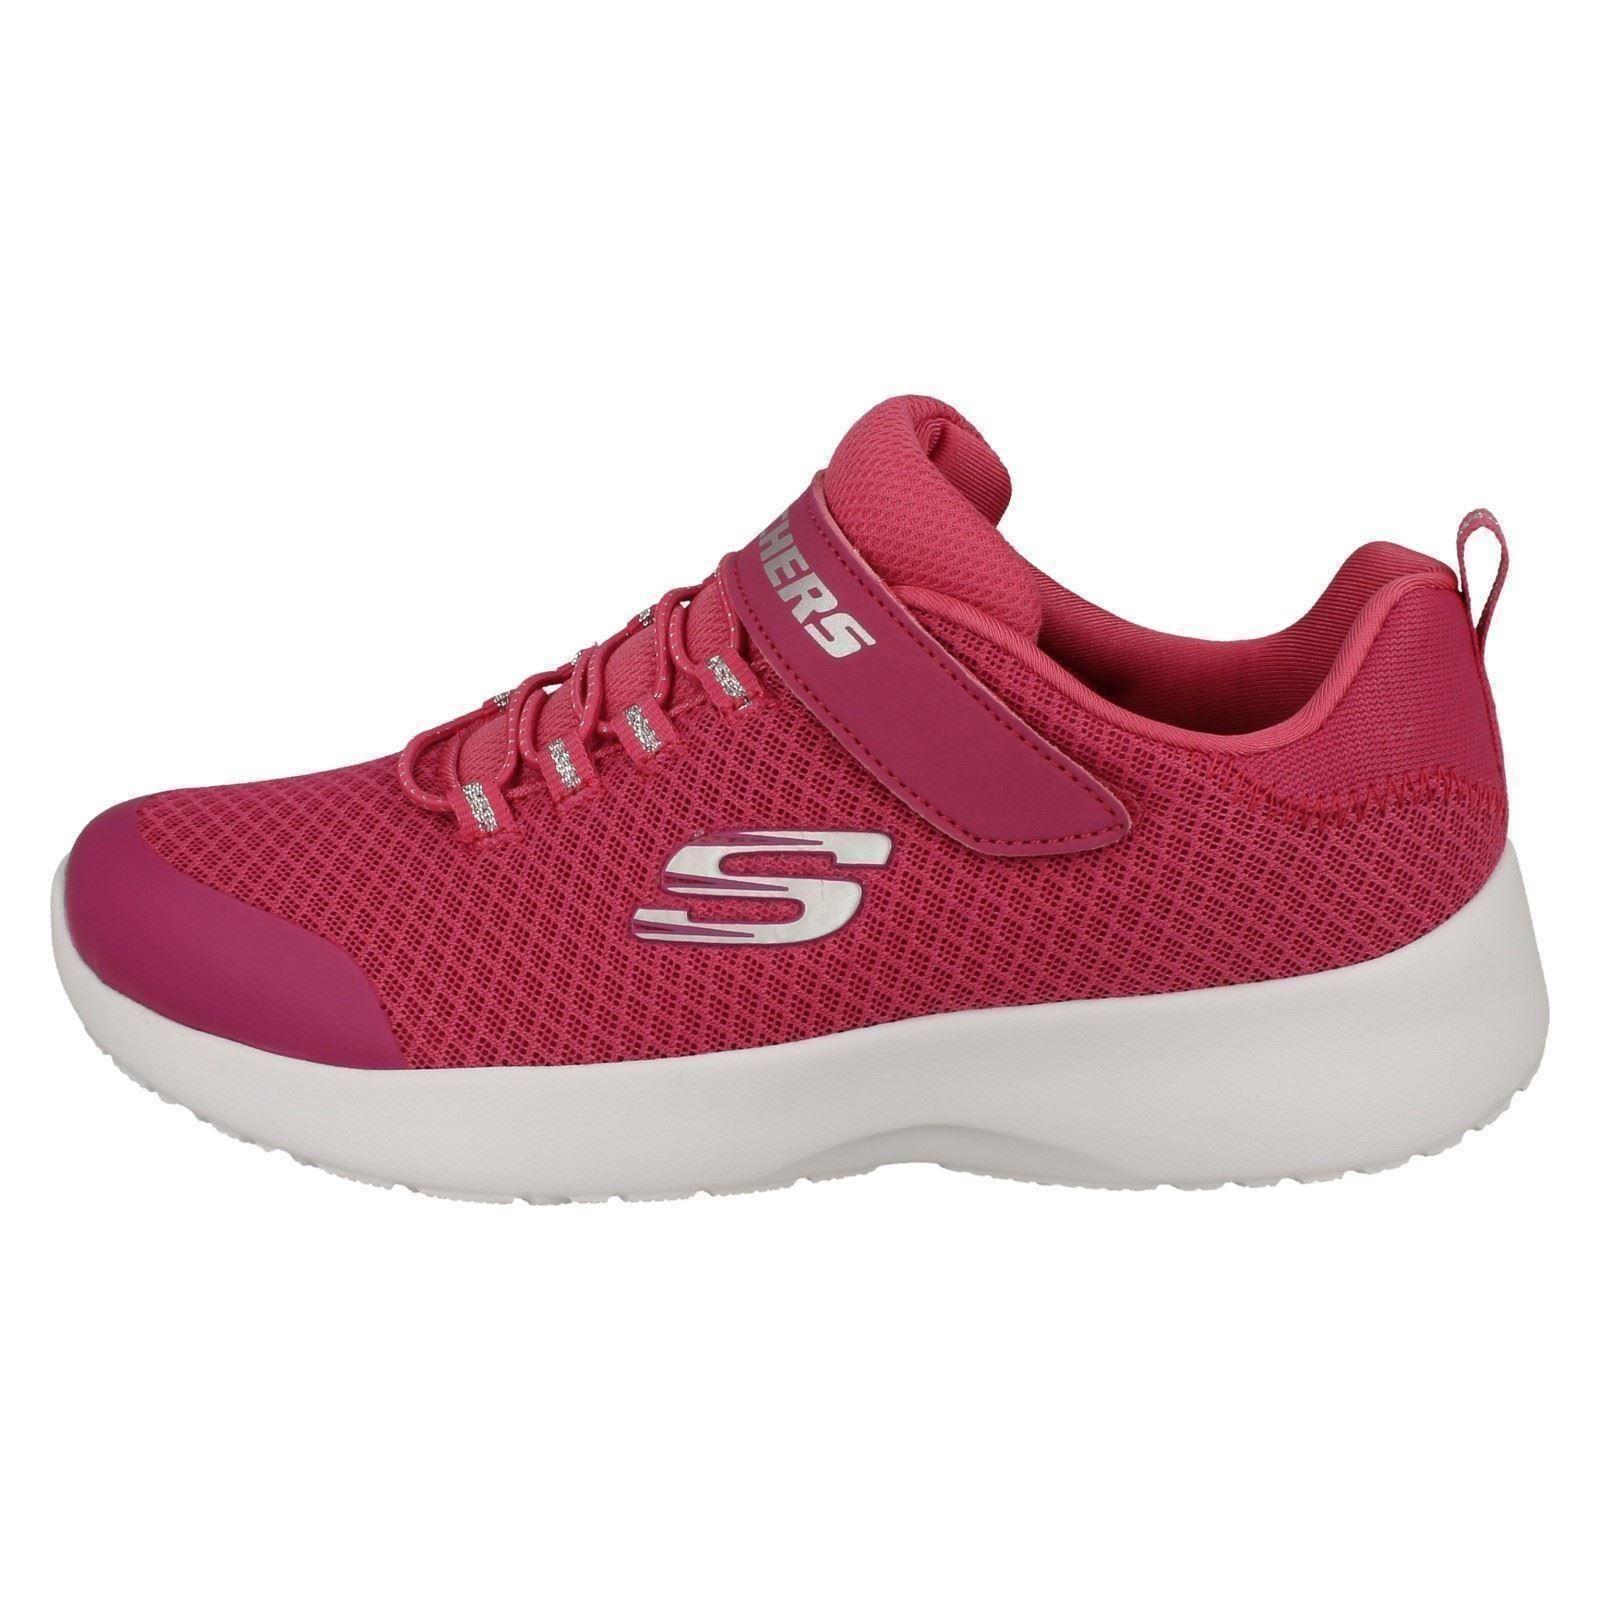 81301 Pink8fd9cdd8f4db2bd633174a12abc58066 Racer Skechers Mädchen SportschuheRally 6IYb7fgyv